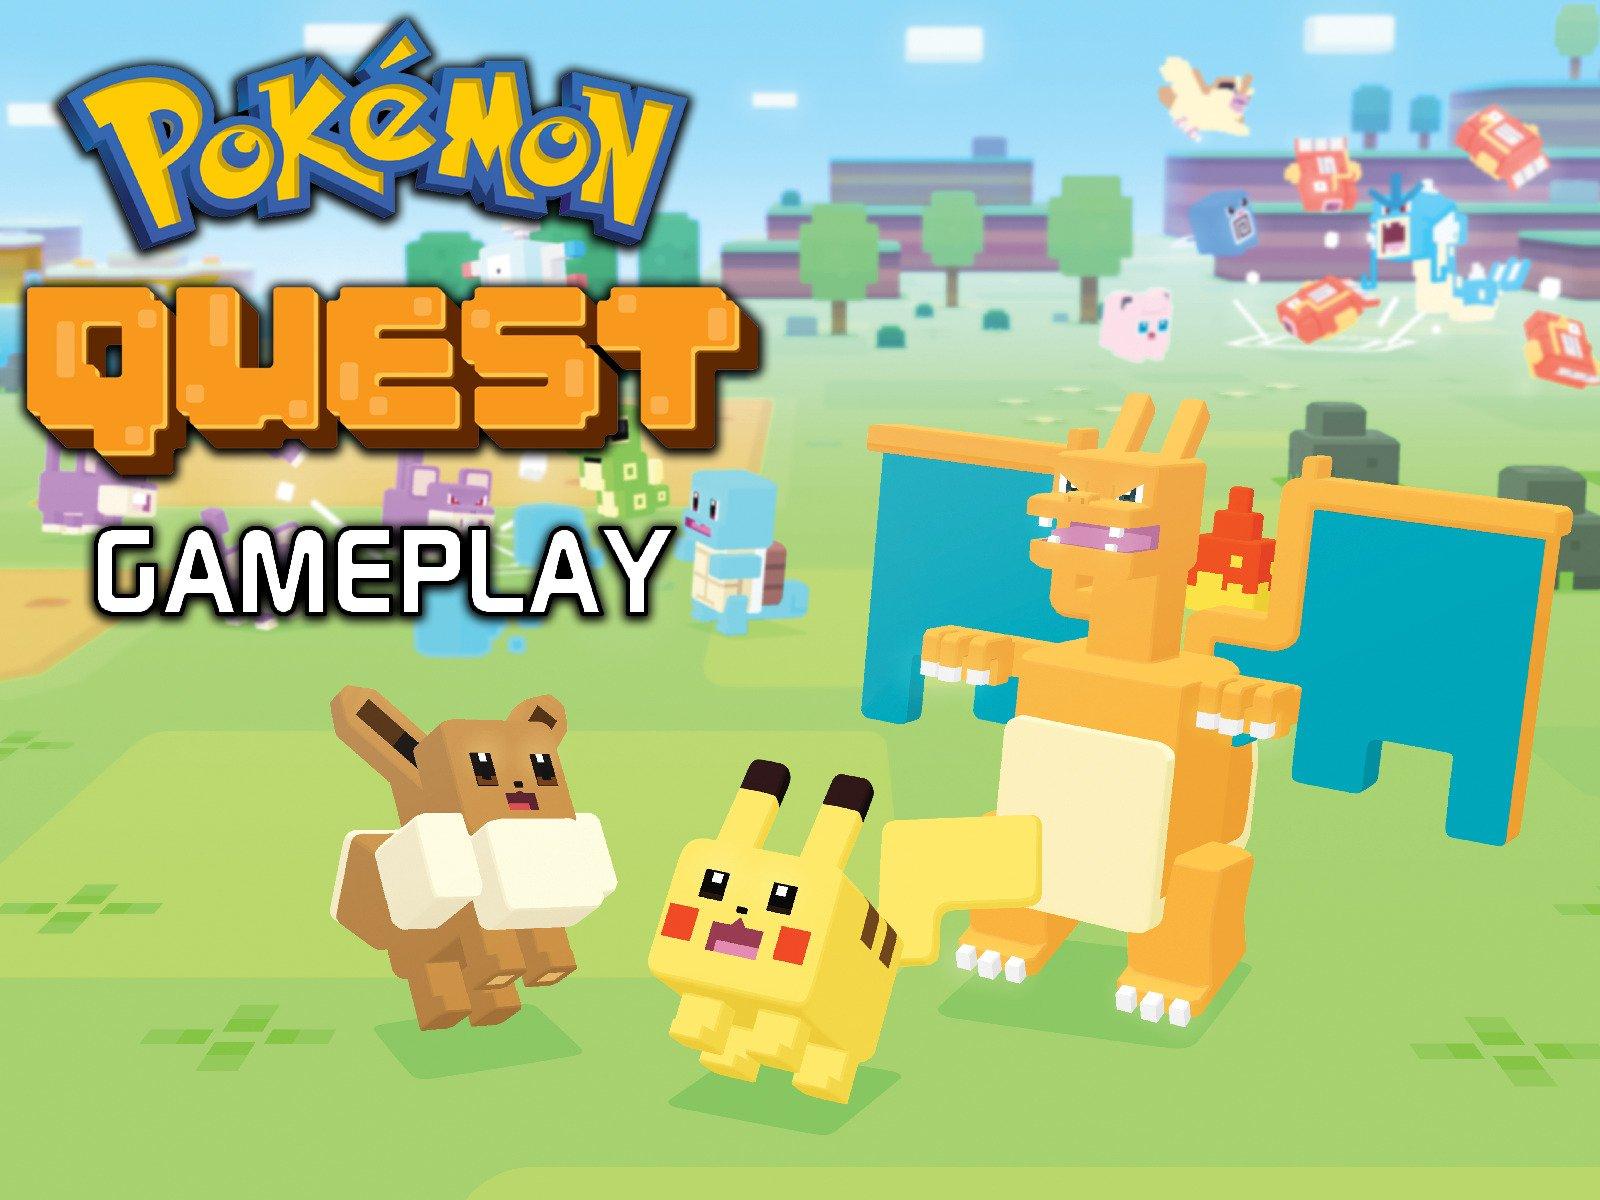 Pokemon Quest Gameplay